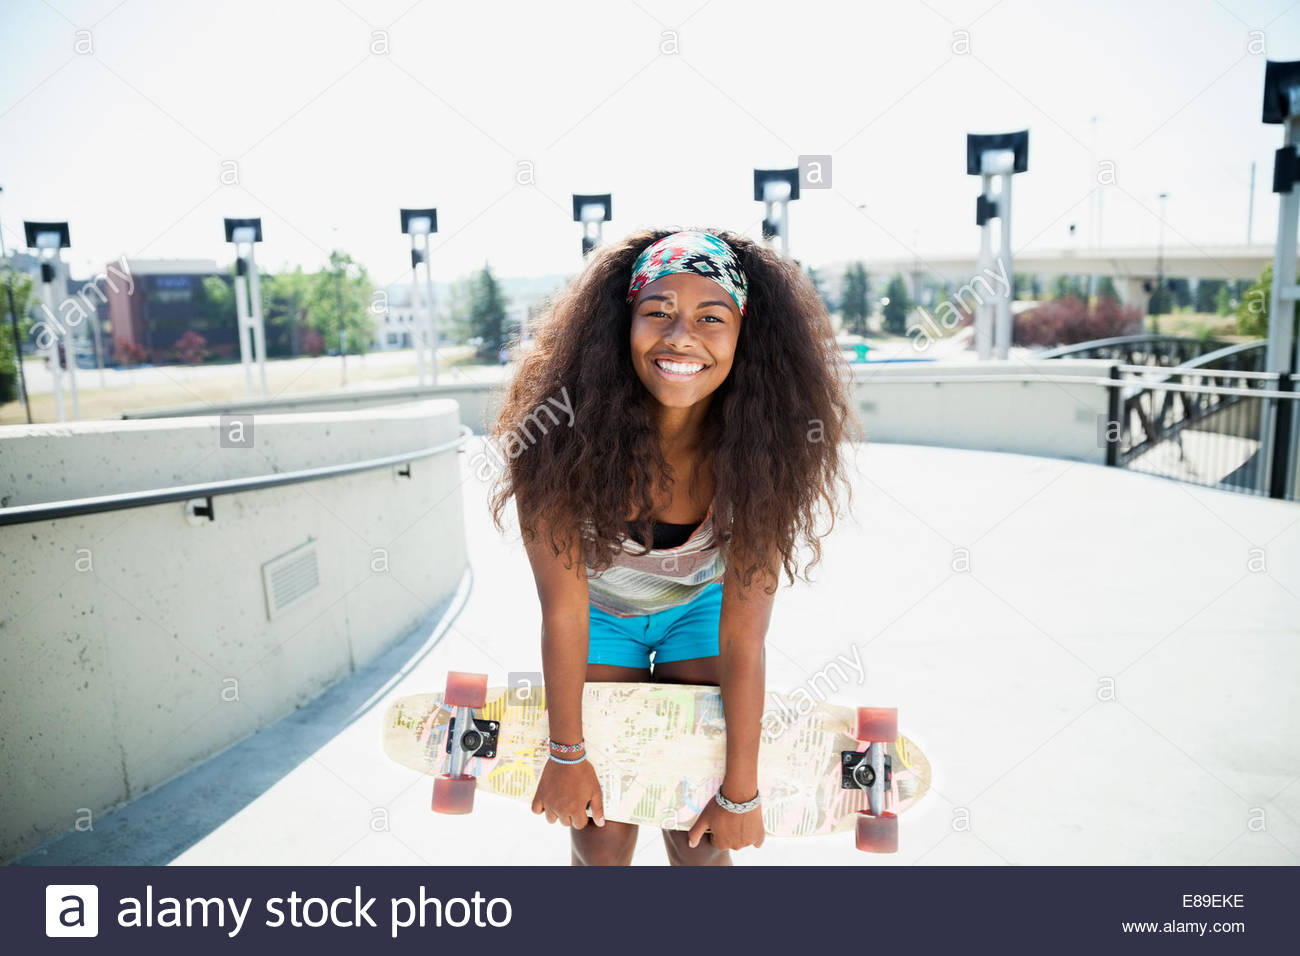 Portrait of teenage girl holding skateboard - Stock Image